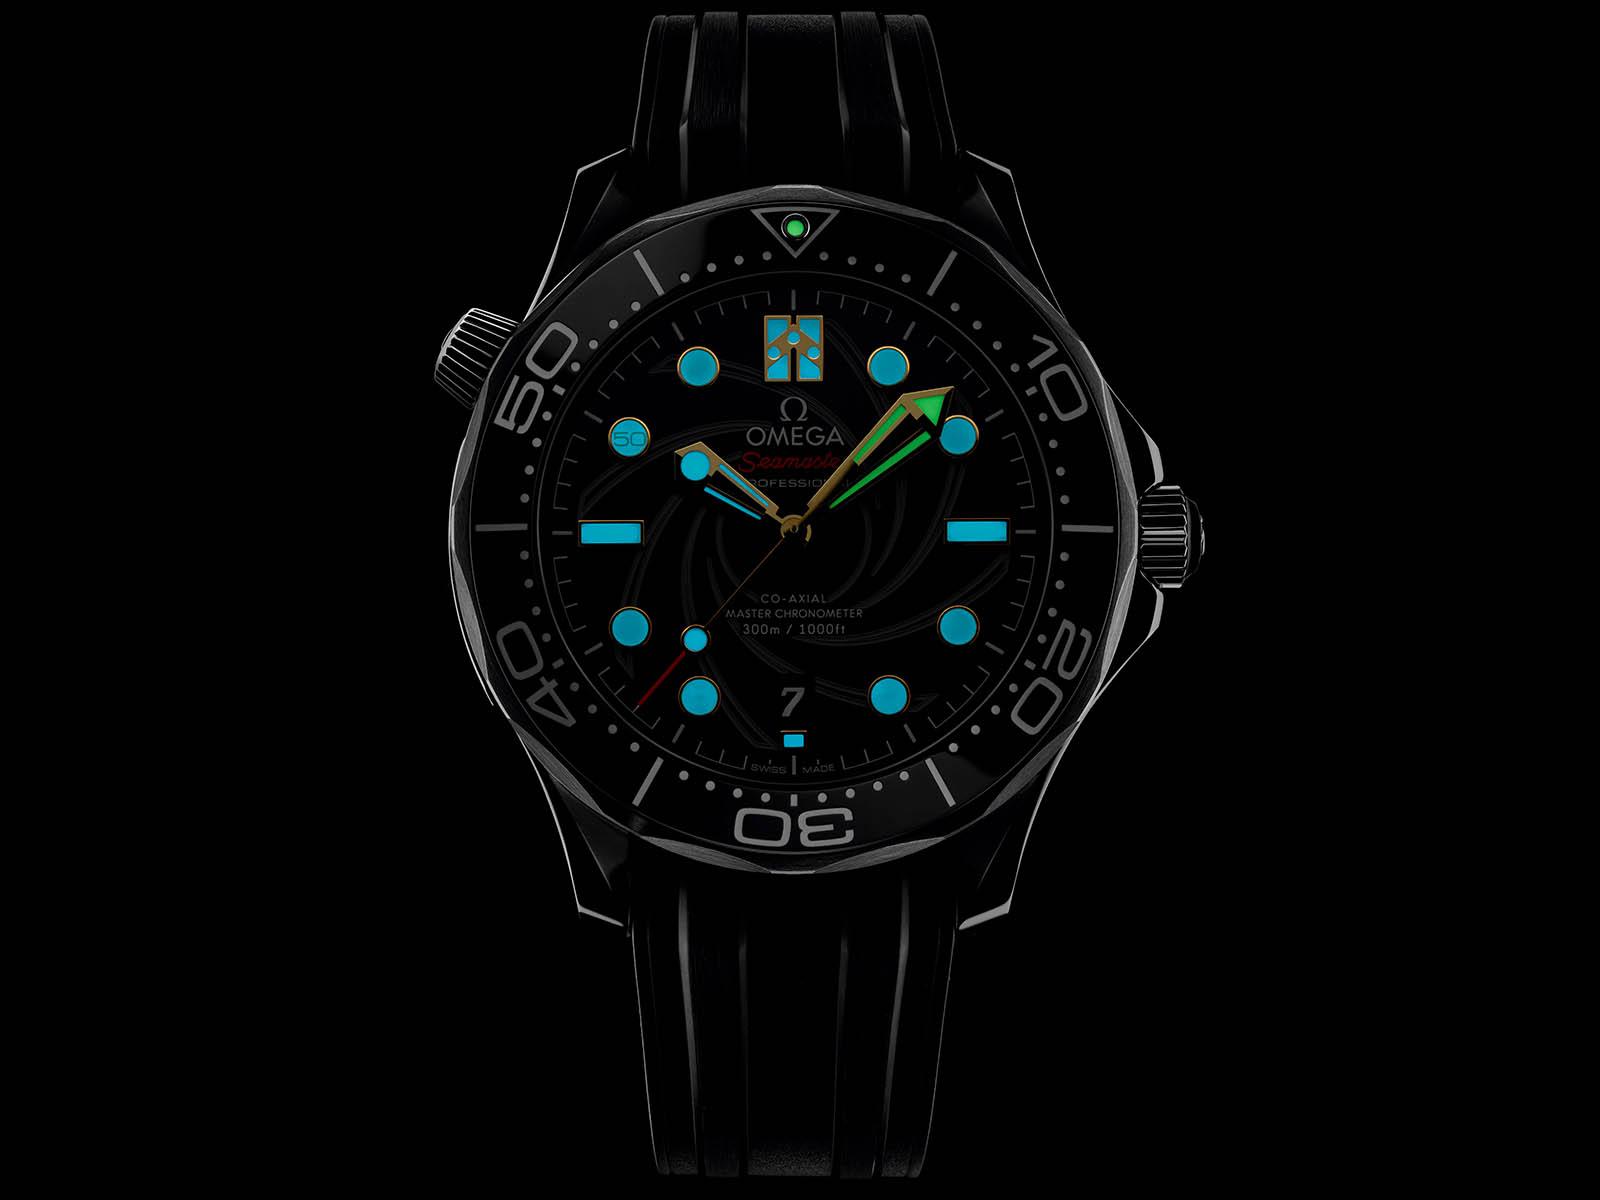 210-22-42-20-01-004-omega-seamaster-300m-diver-007-8-.jpg